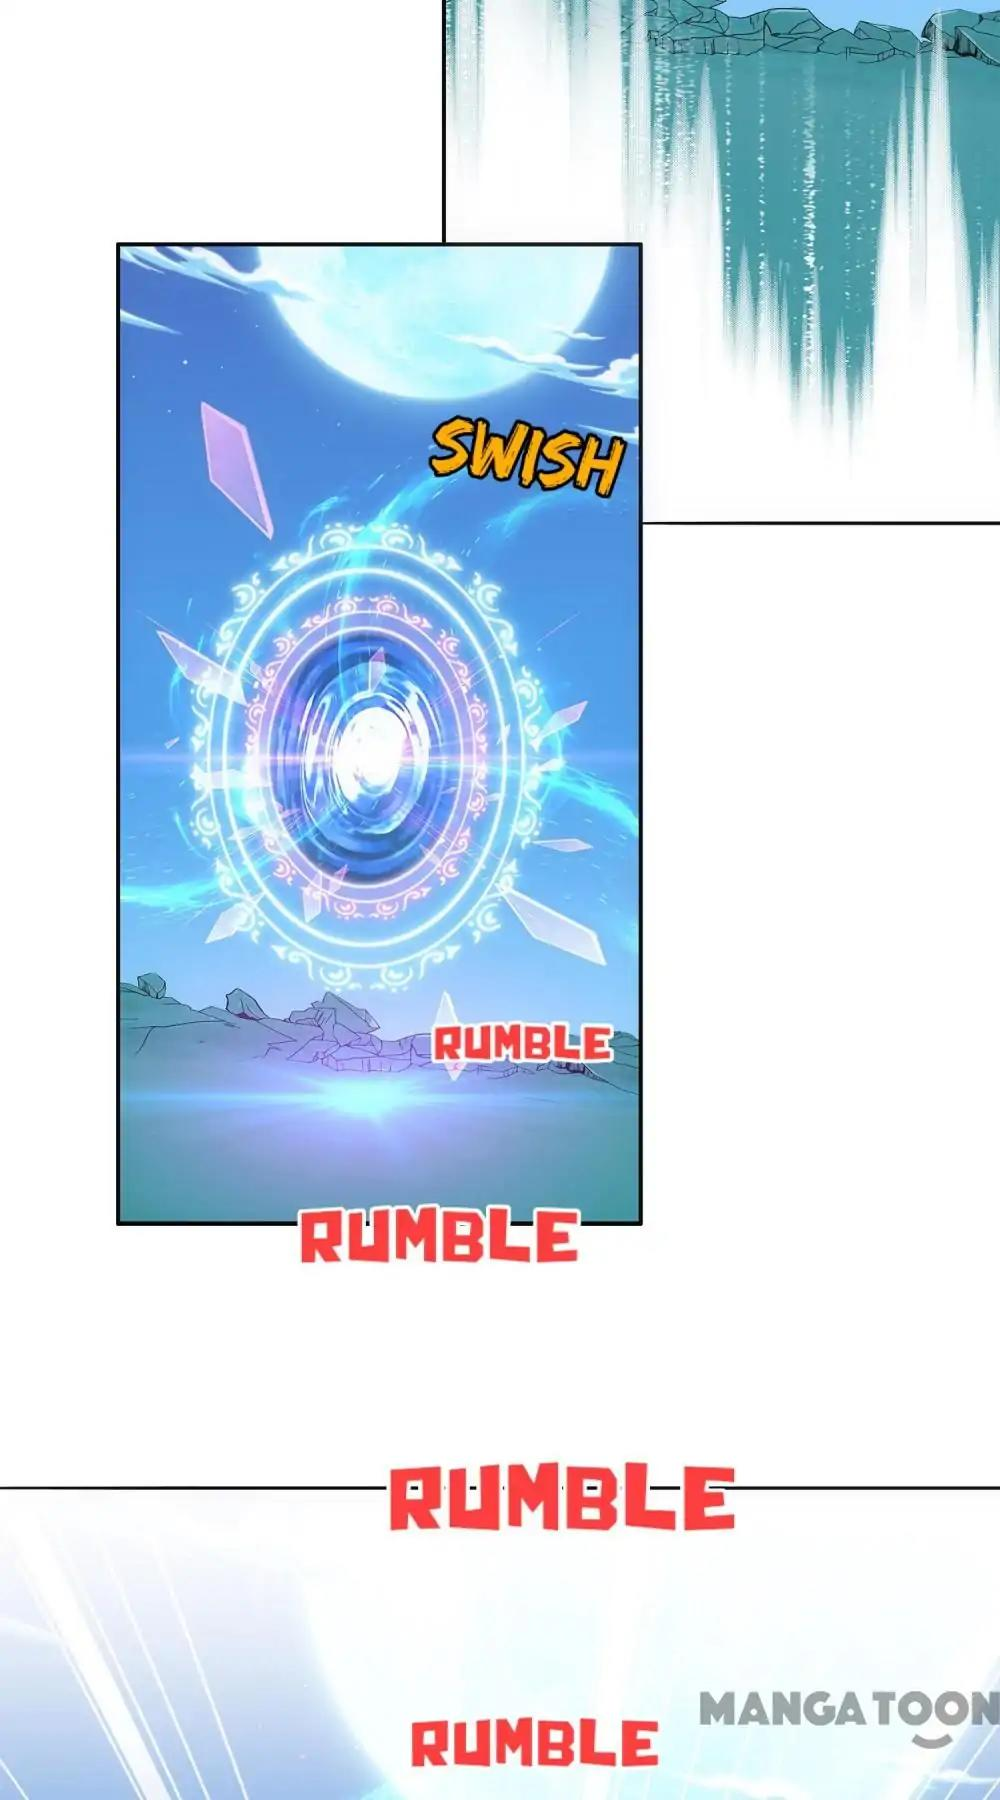 https://img2.nineanime.com/comics/pic2/60/30716/1041912/7b1d3c756fcf7fa90af459bcde18b1d8.jpg Page 2